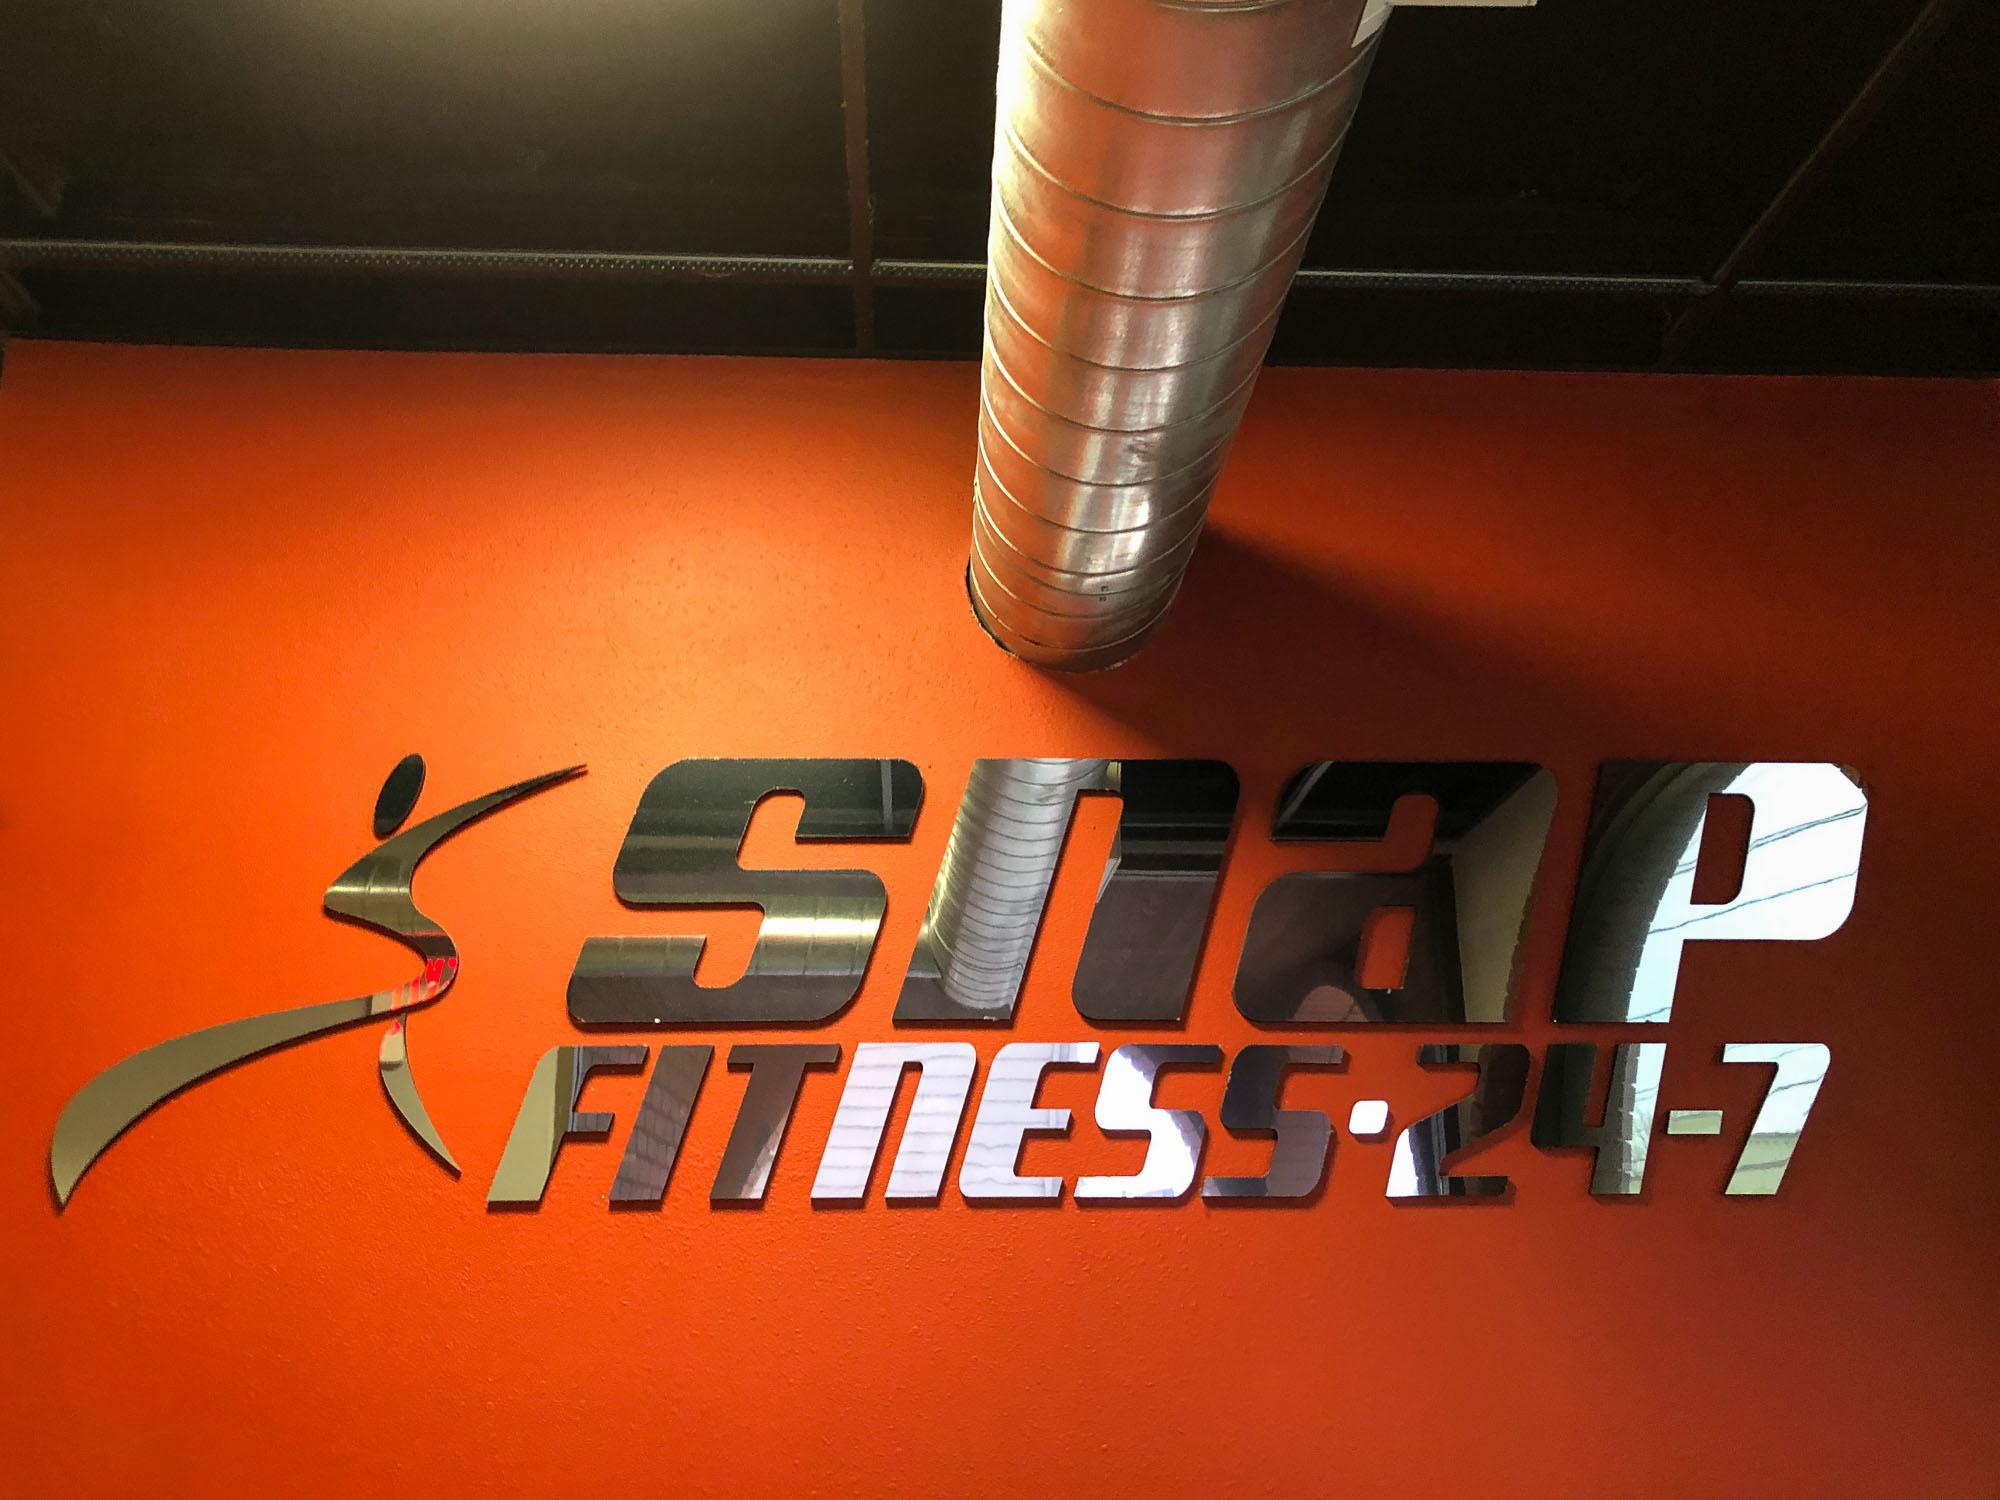 visit-sellwood-moreland-business-alliance_snap-fitness-6.jpg